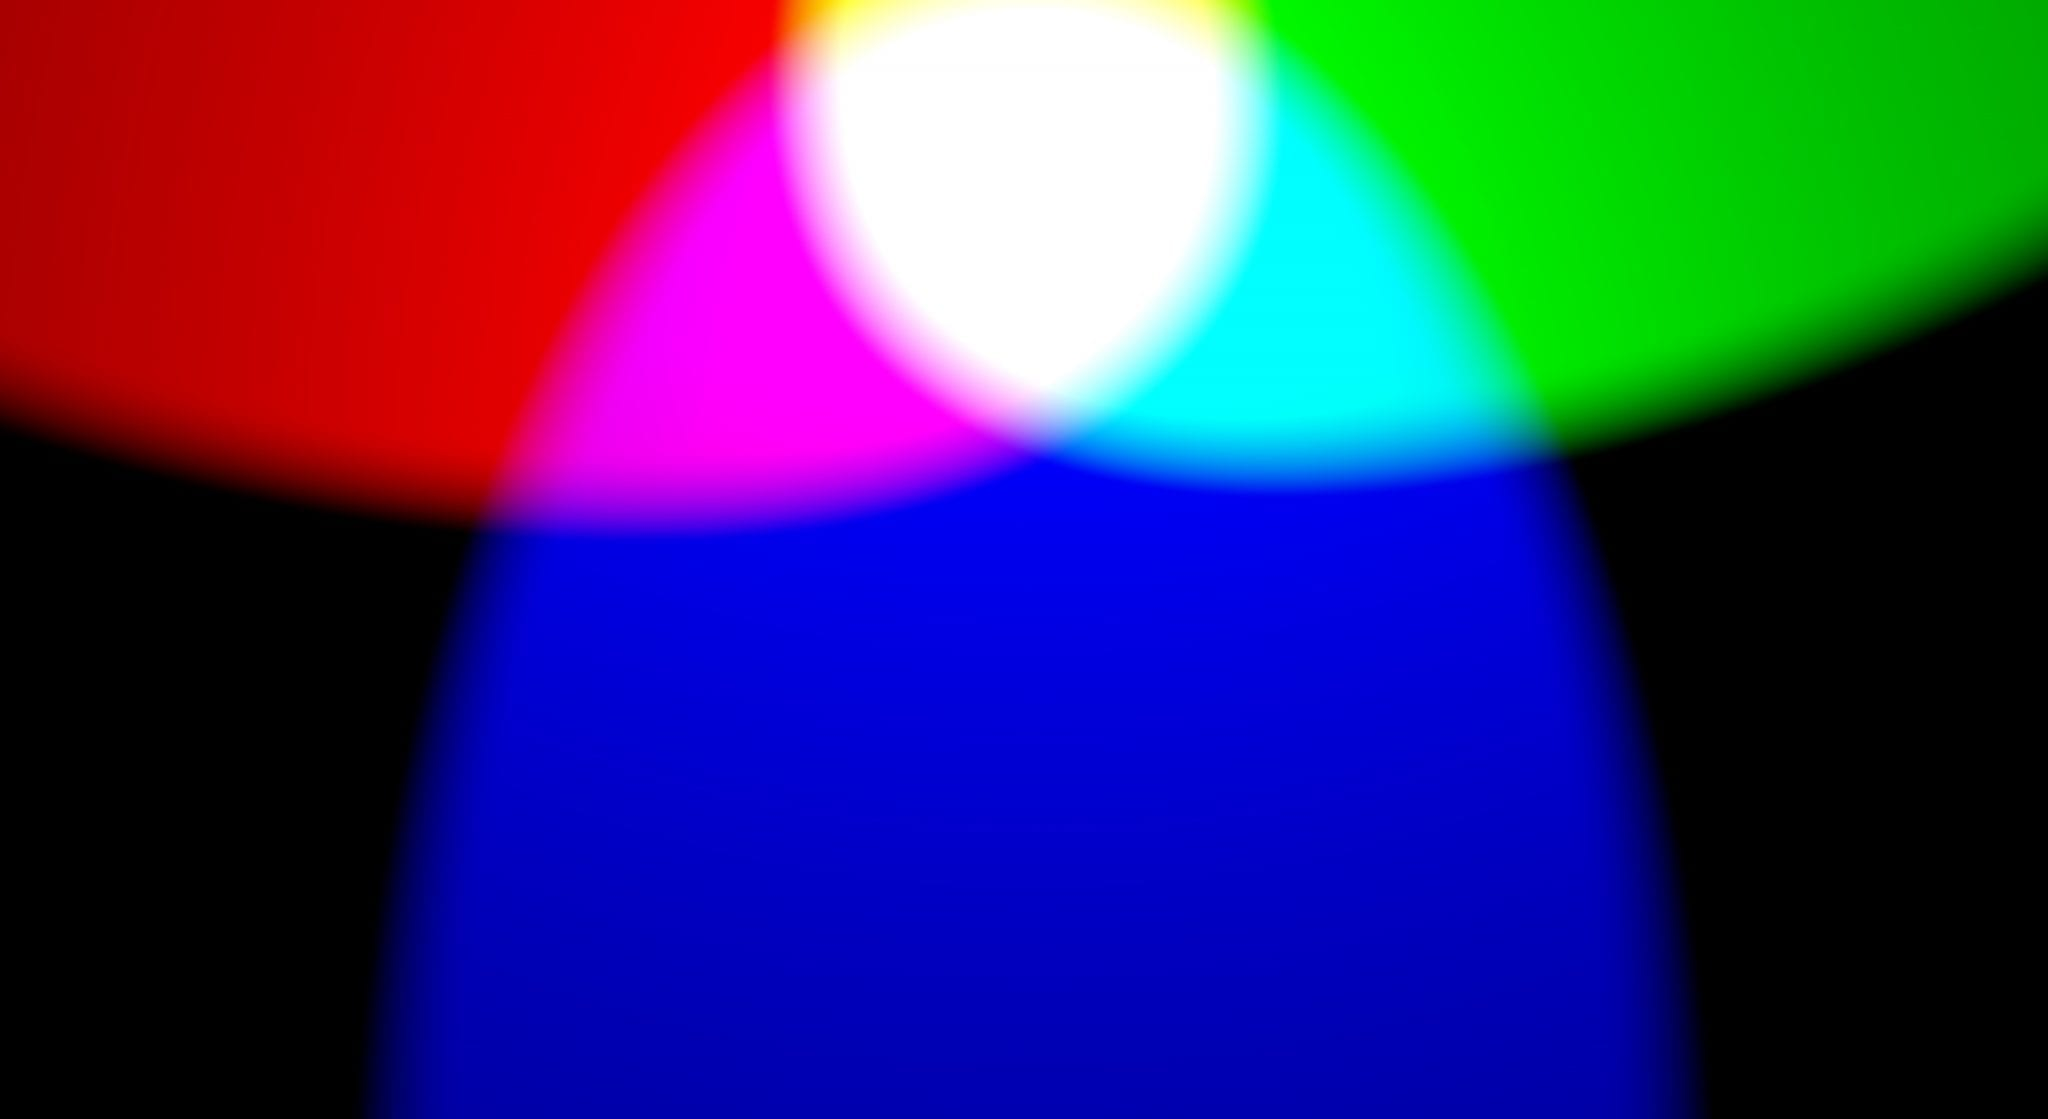 Chromaticity of Phosphors